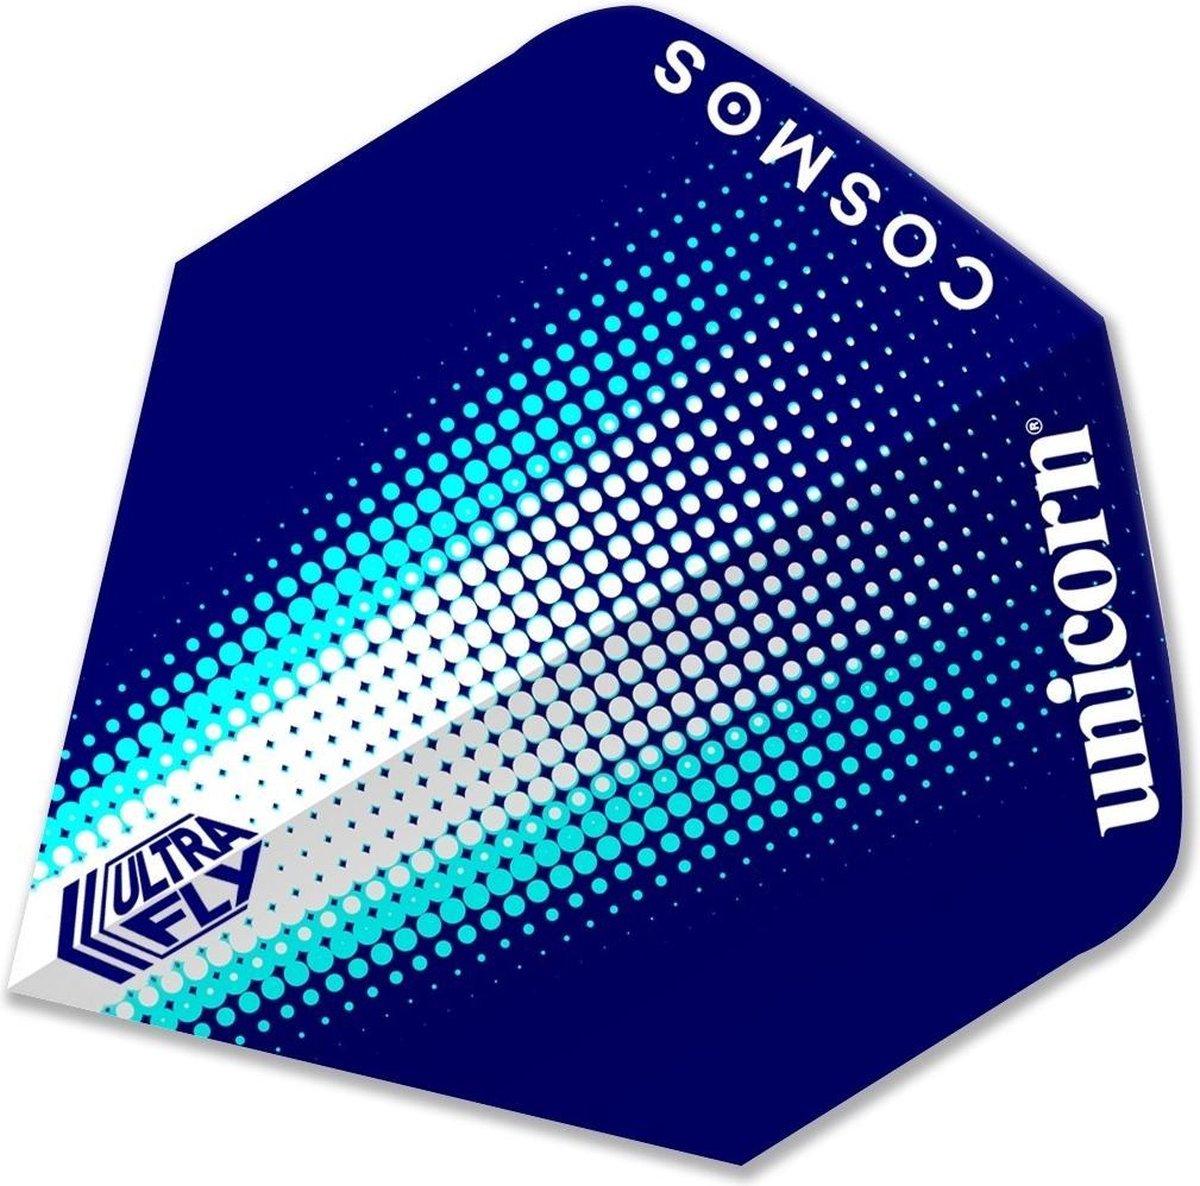 Unicorn Ultrafly Flights 100 Micron Cosmos Comet Plus